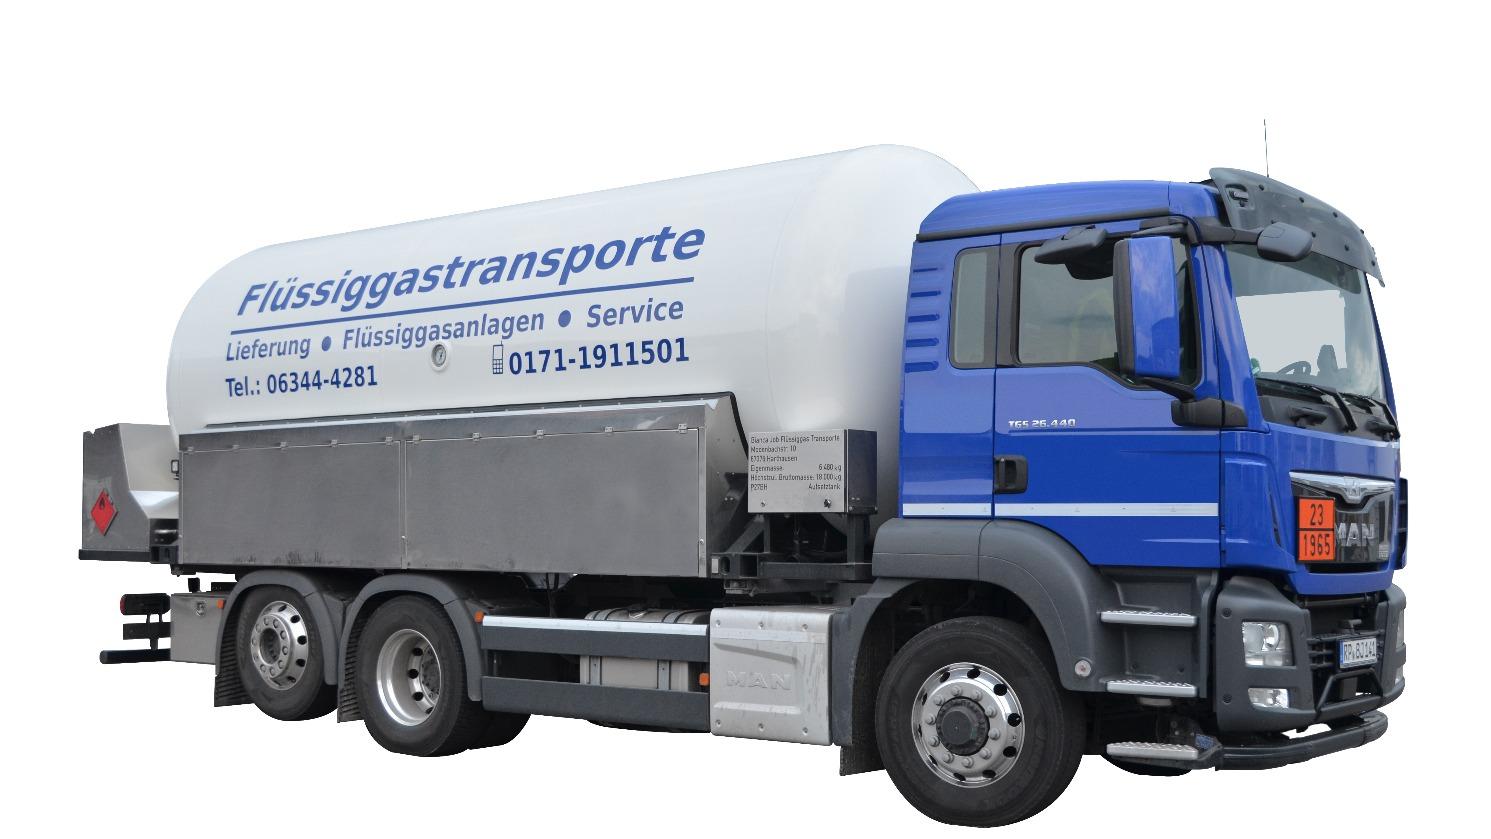 JOB FLÜSSIGGAS TRANSPORTE